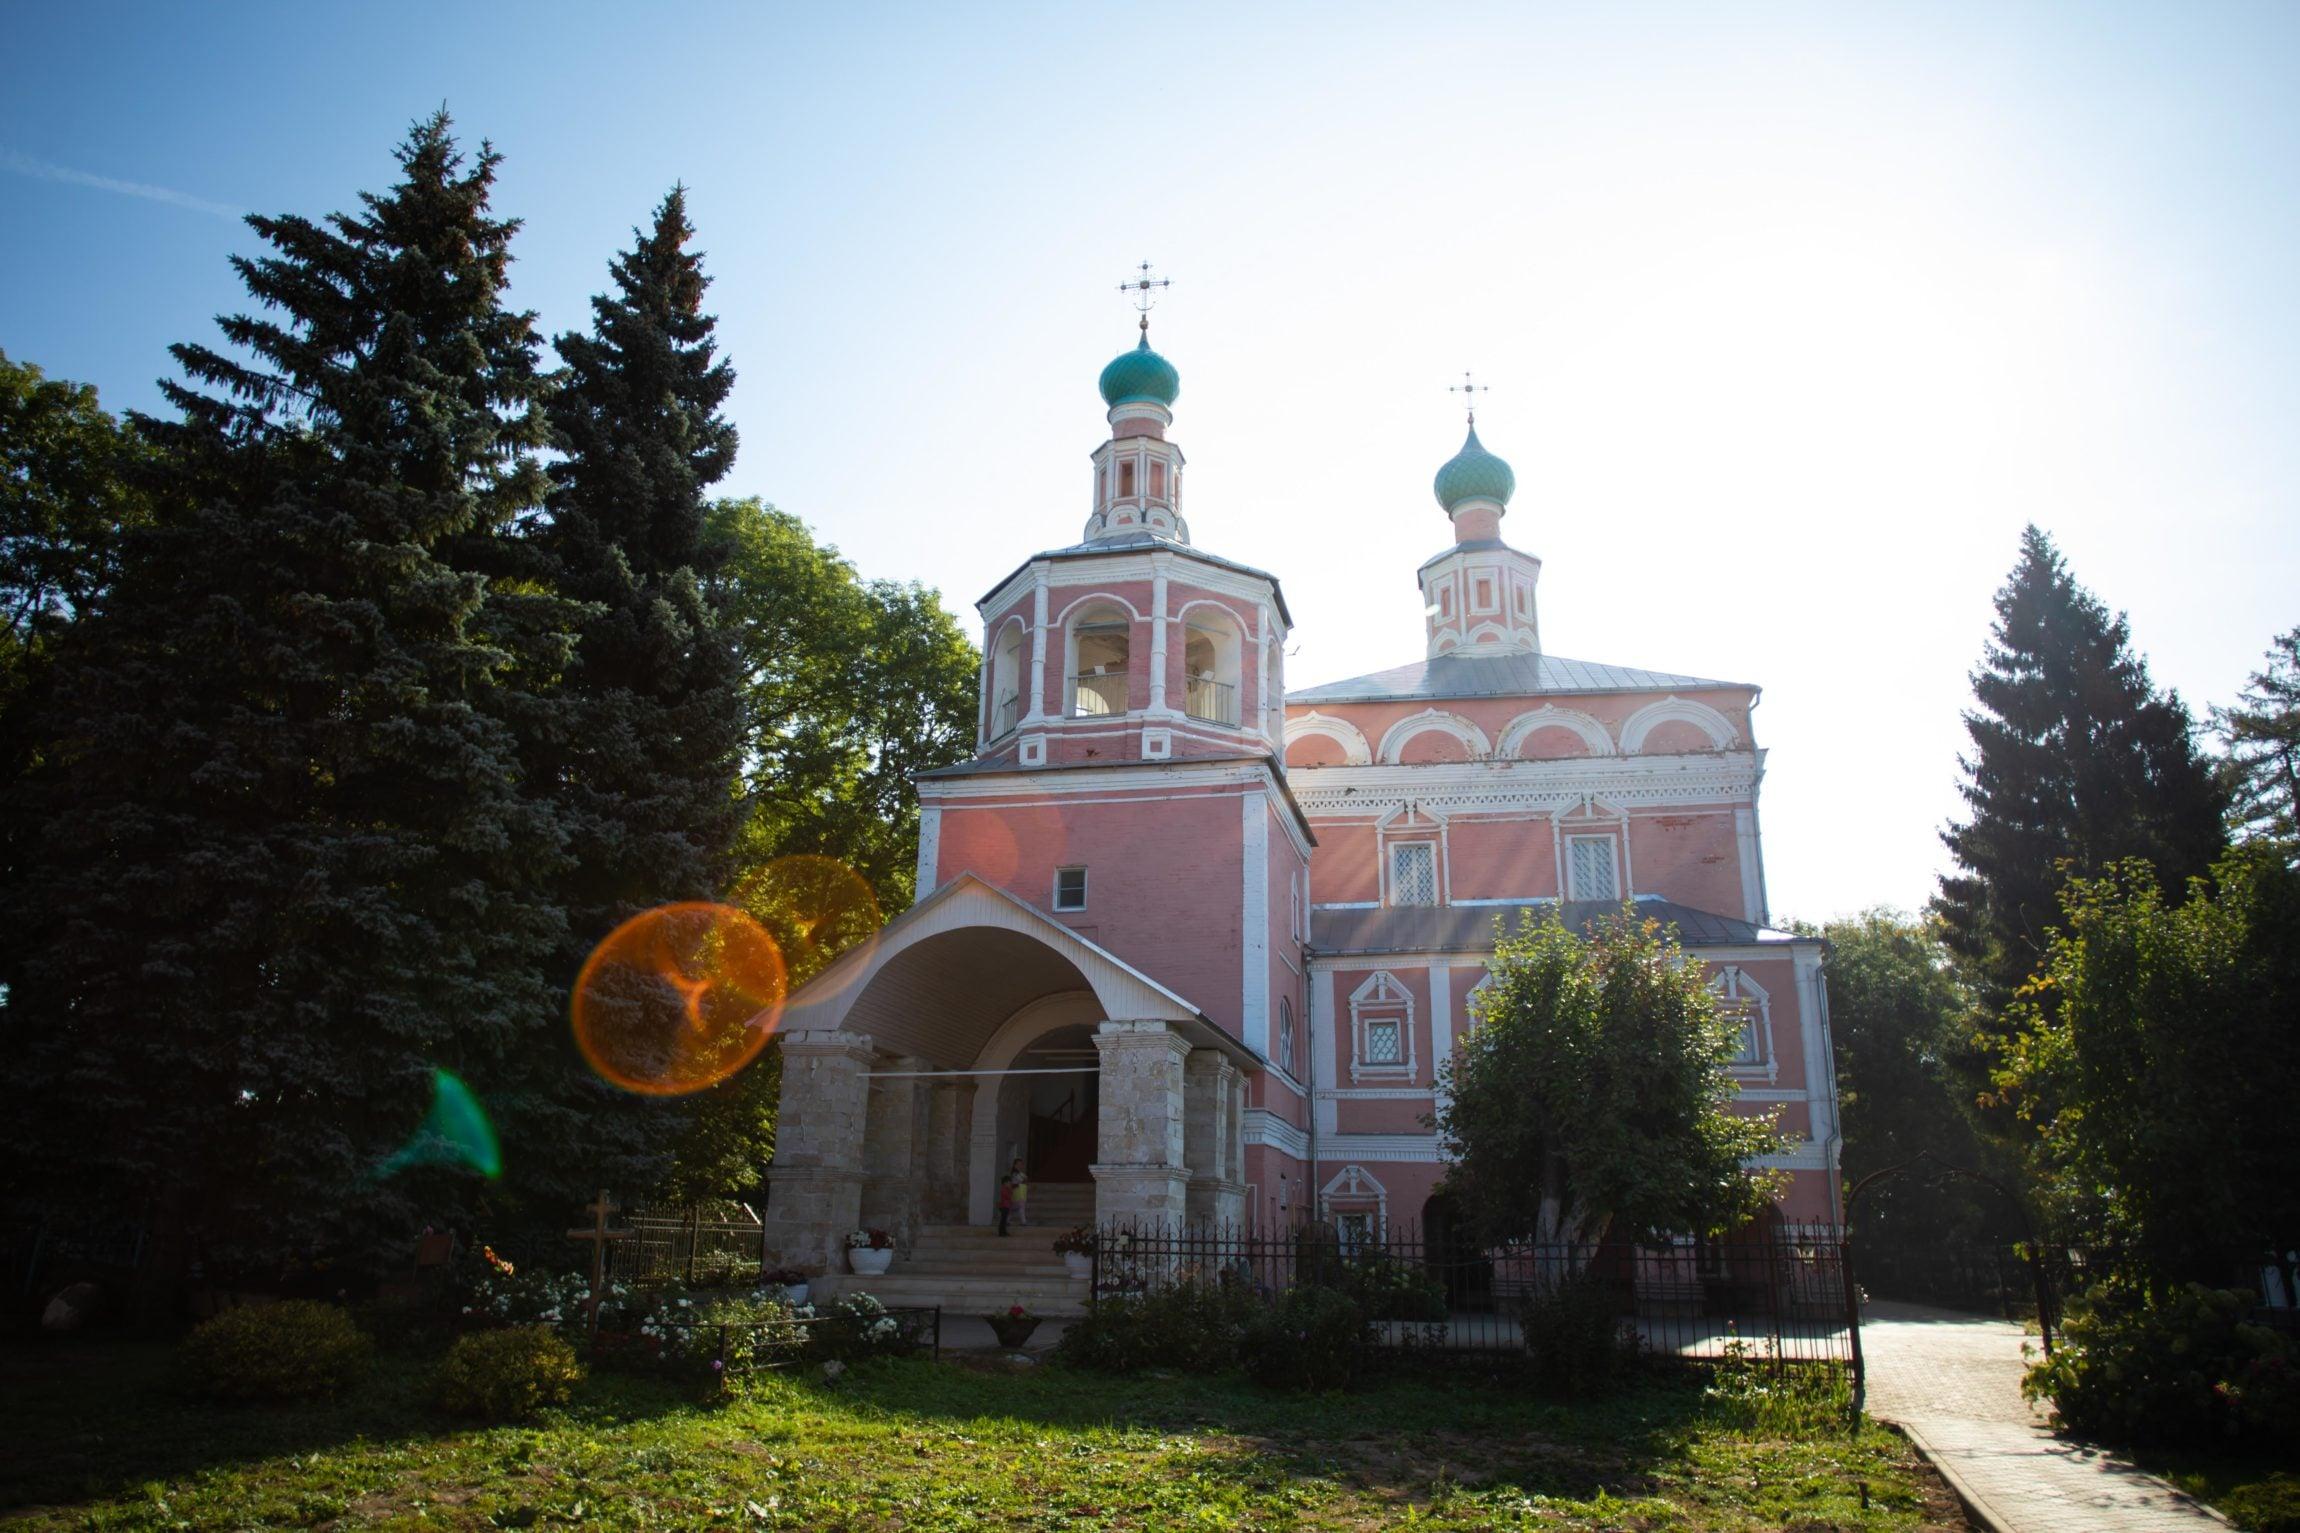 http://monuspen.ru/photoreports/143c0879173e3e11c82dee859362f212.jpg